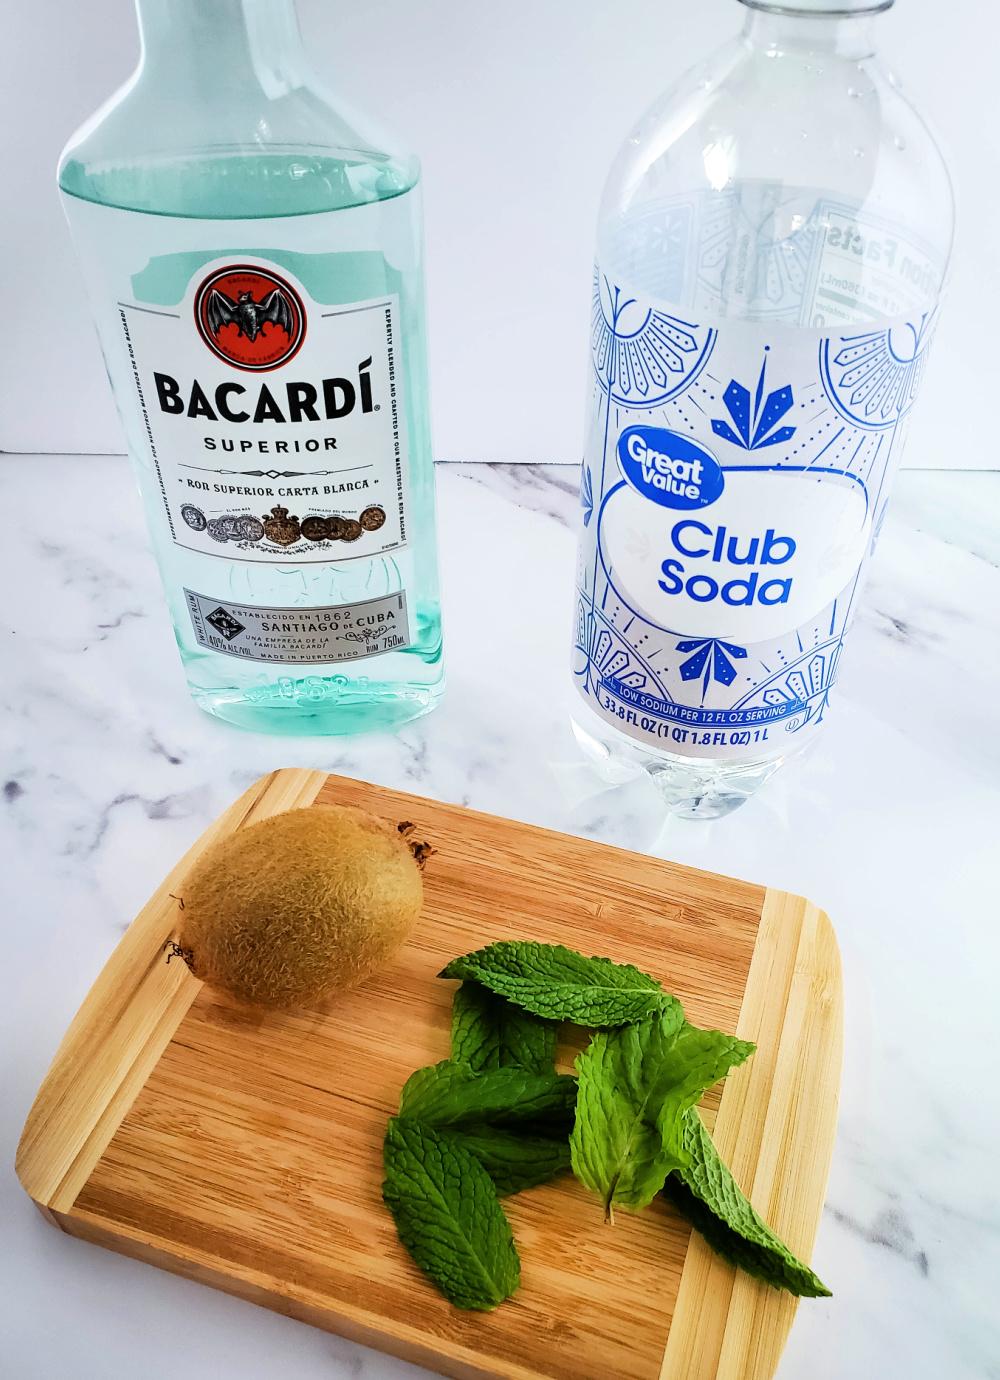 Kiwi Mojito ingrediants -  rum, club soda, kiwi and mint shown on a cutting board.